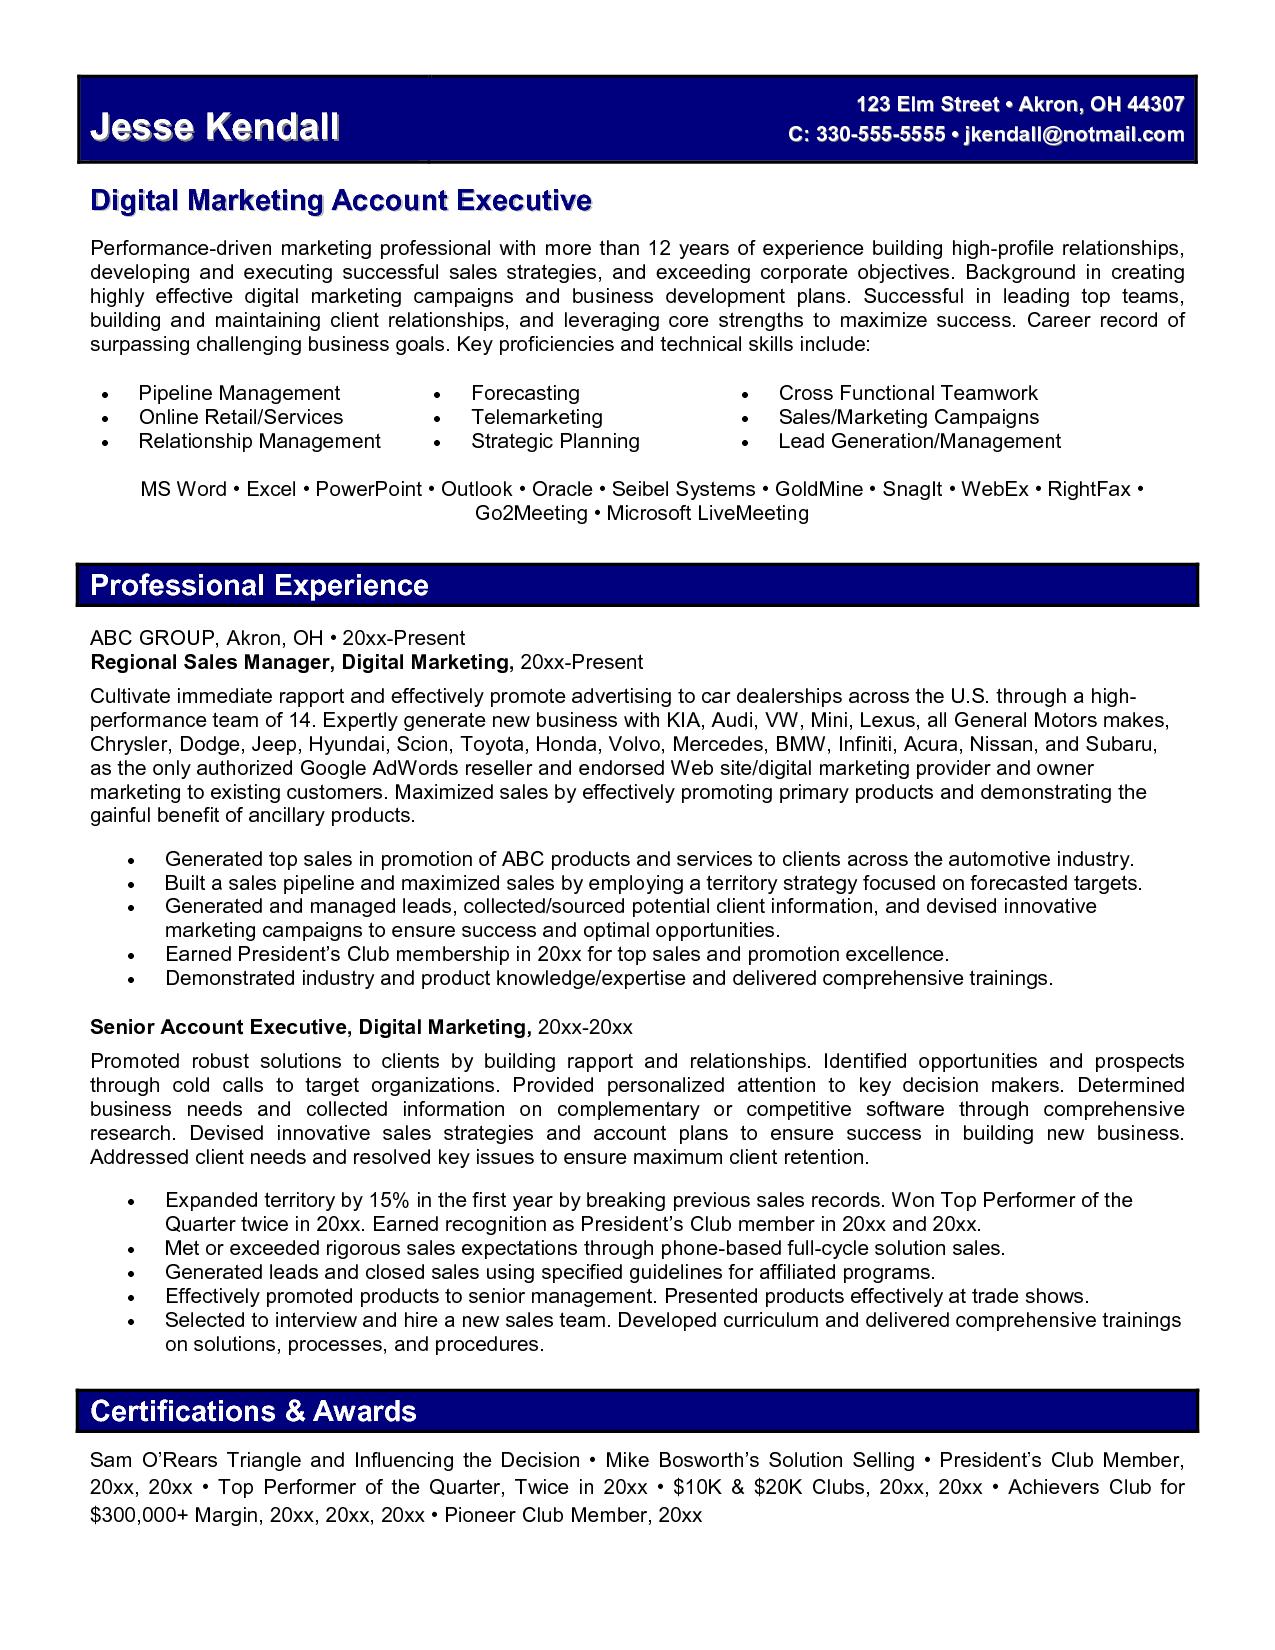 Digital Marketing Manager Resume Objective Best Resume Examples